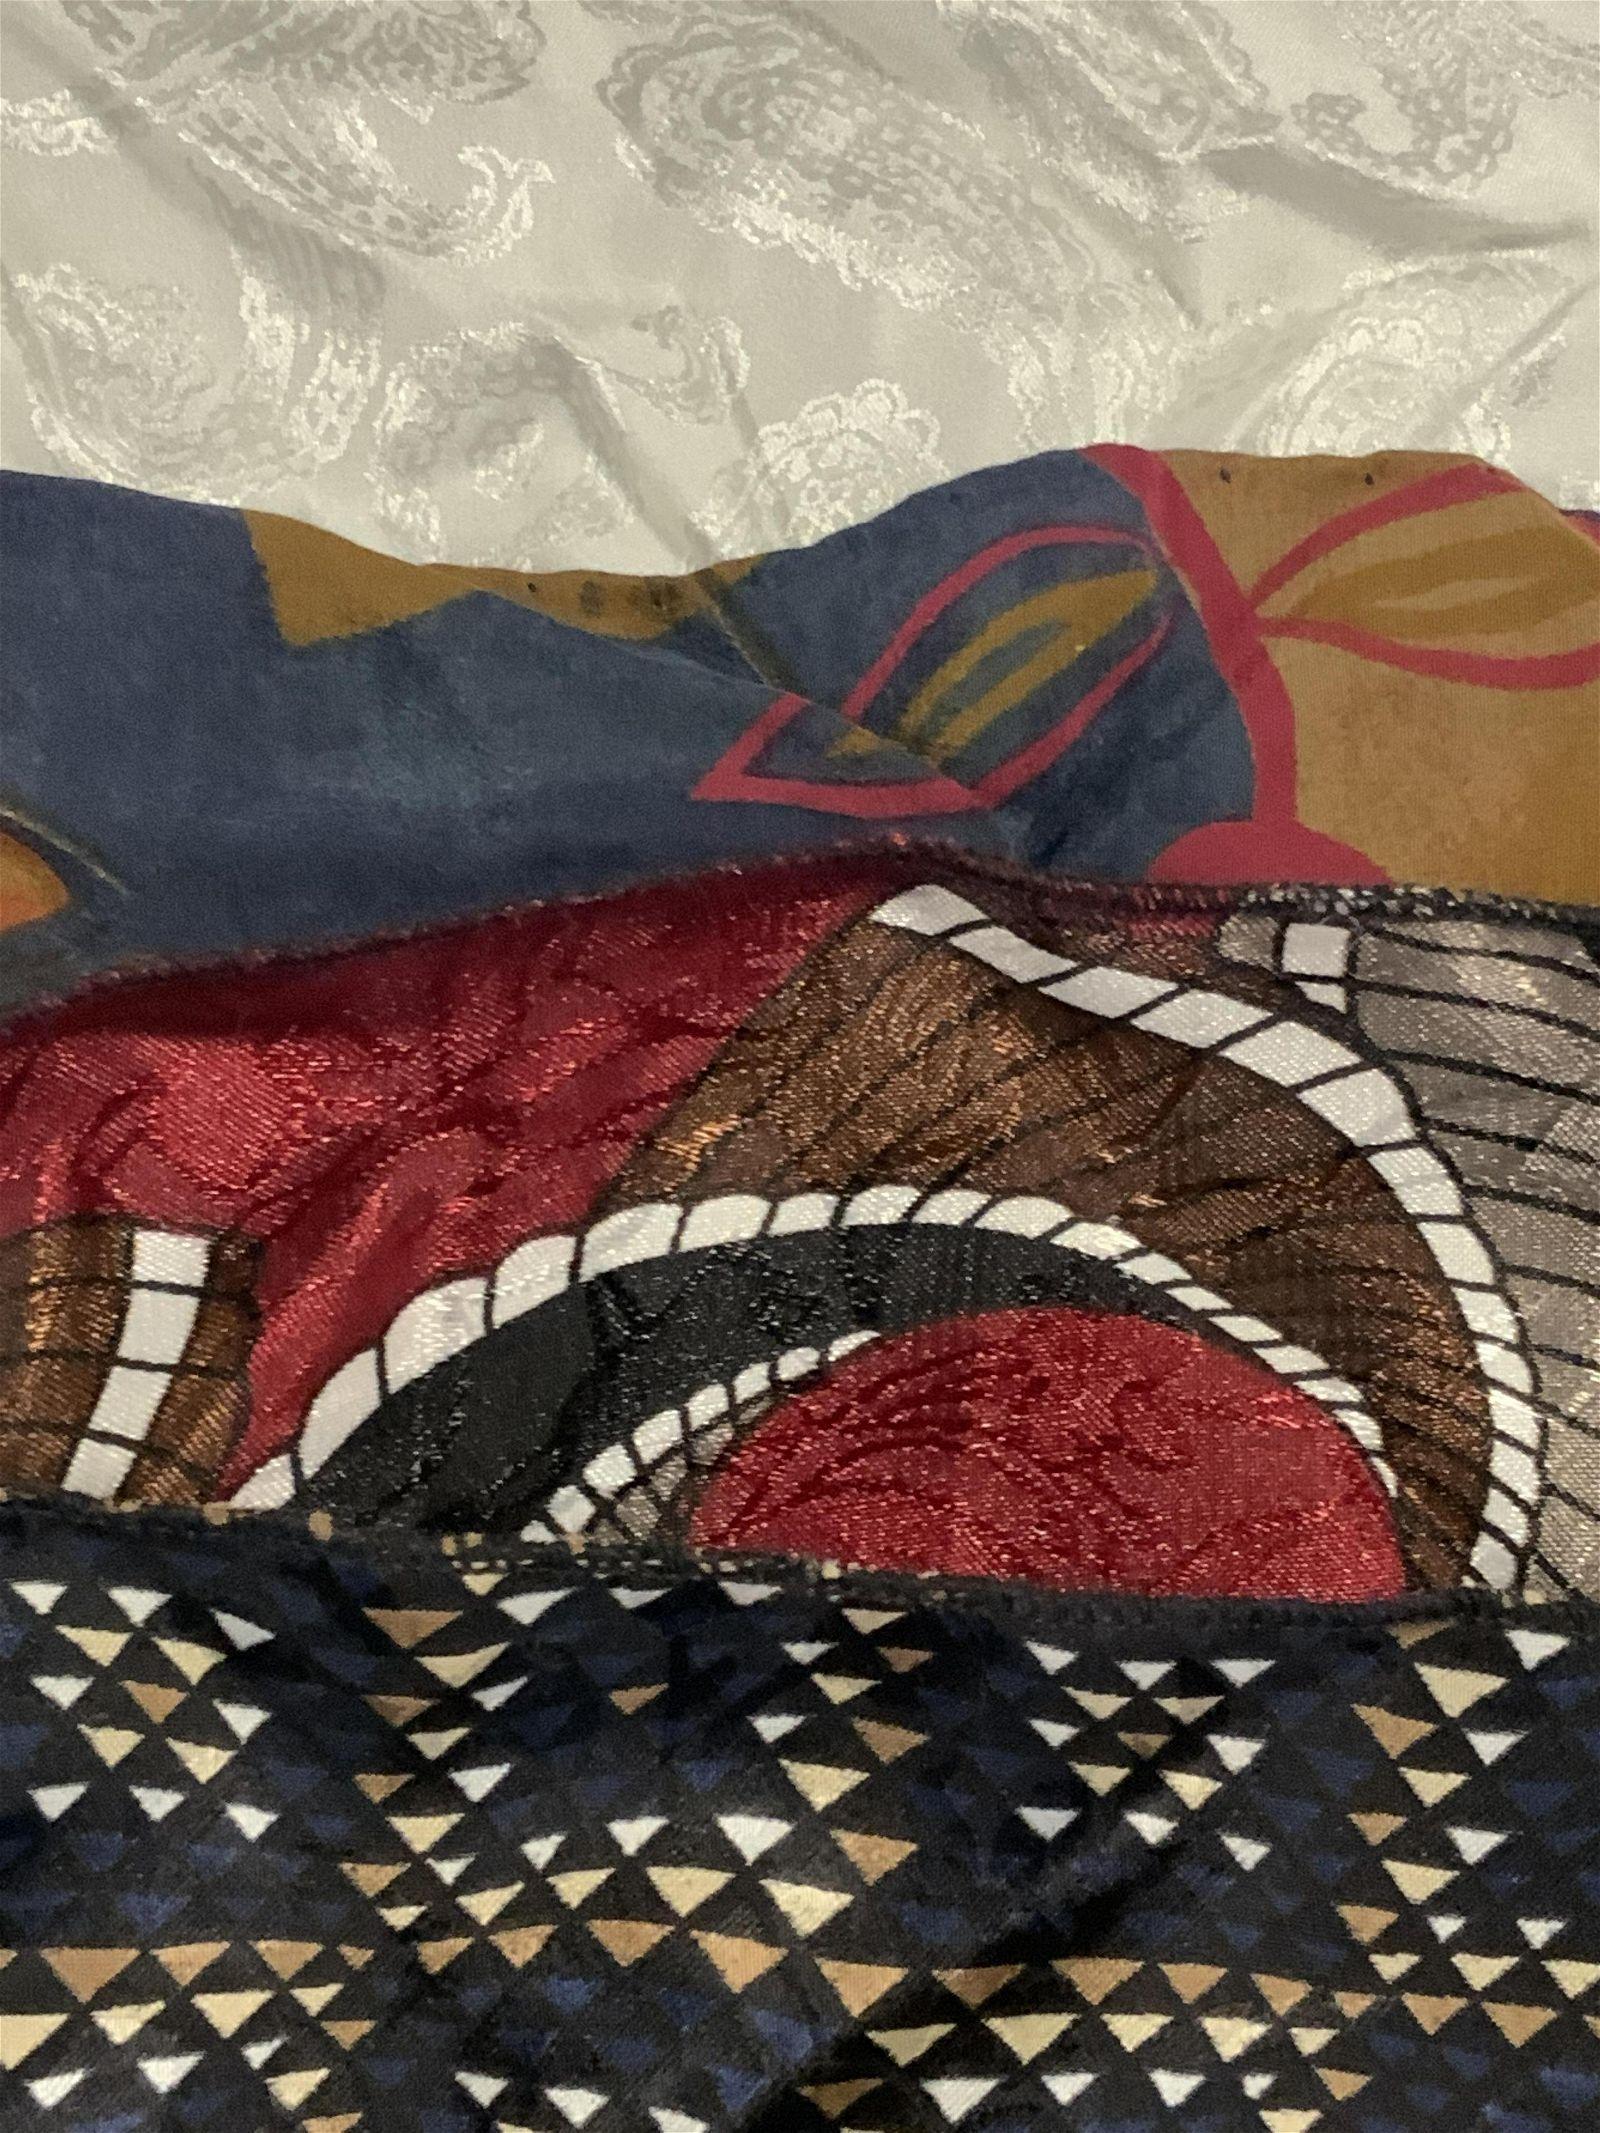 9p Vntg Silk Handkerchiefs, Christian Dior & More